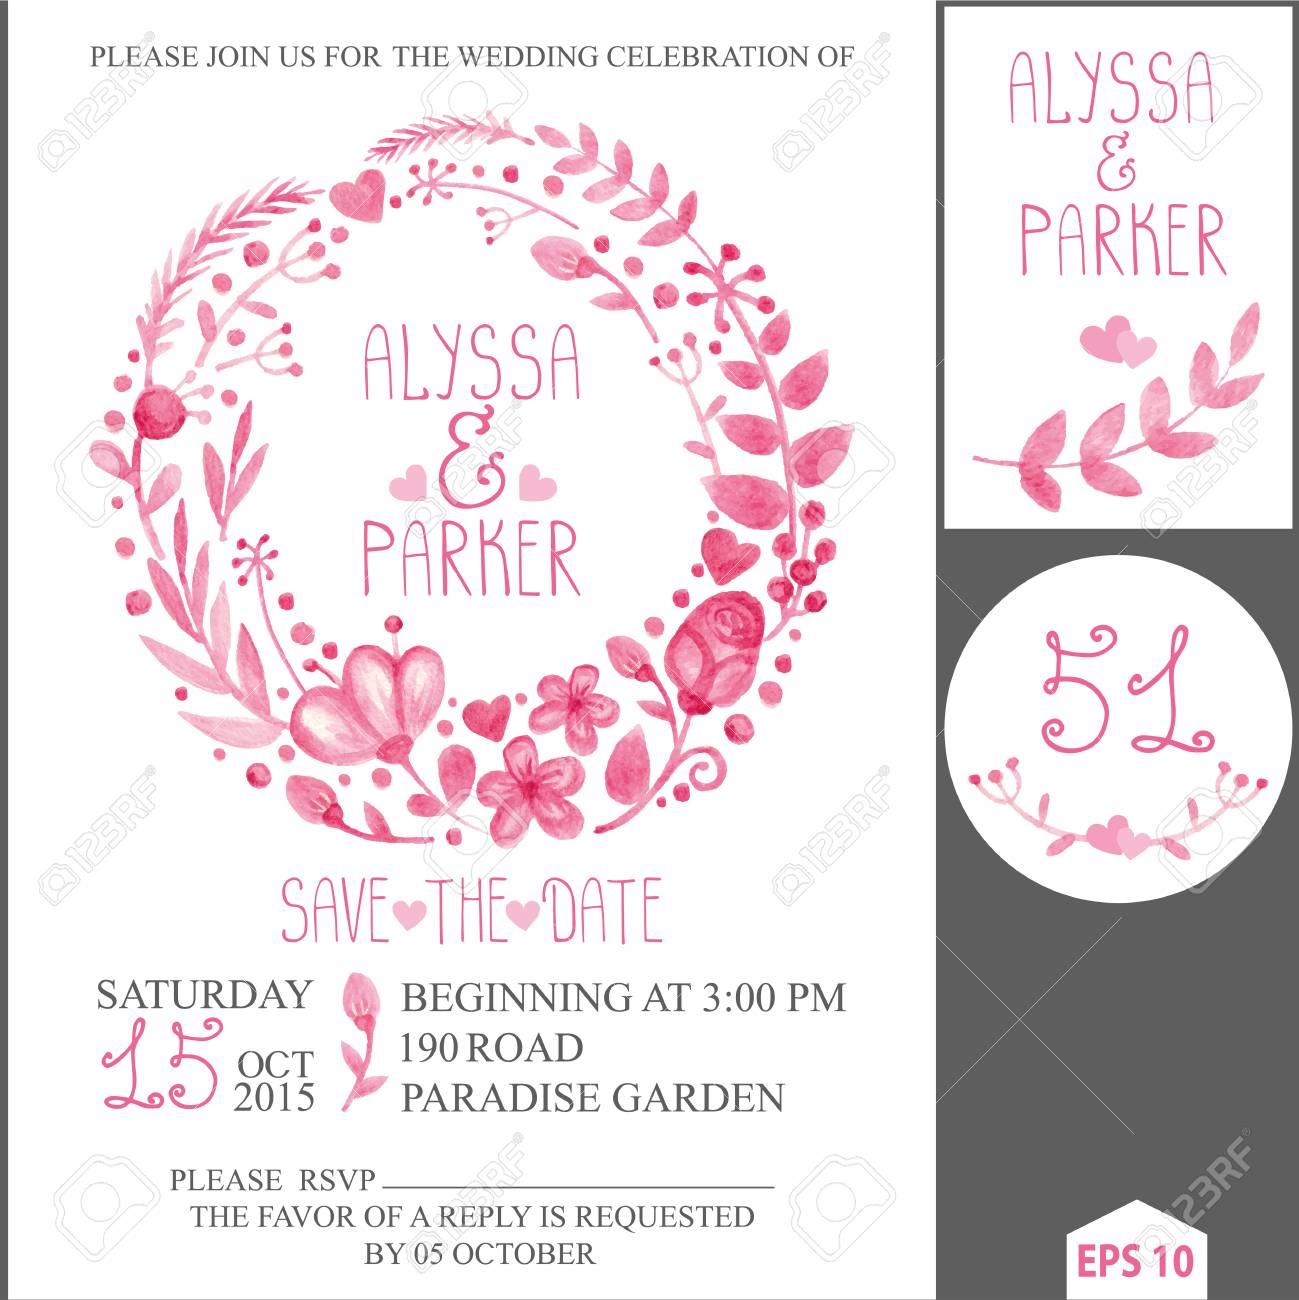 Watercolor.Retro Wedding Design Template.Pink Floral Wreath ...